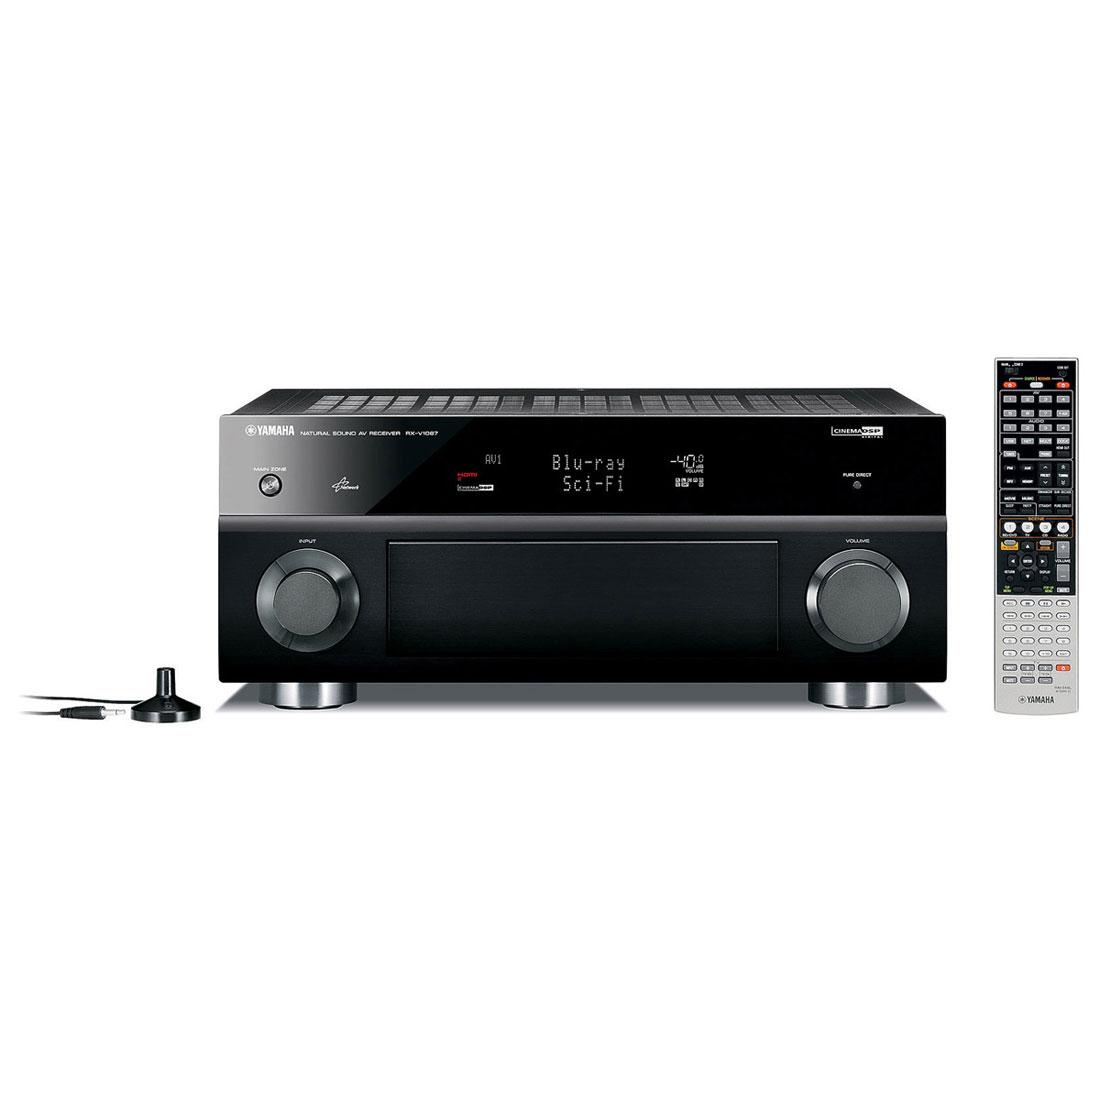 Ampli home cinéma Yamaha RX-V1067 Noir Ampli-tuner Home Cinema 3D Ready 7.2 DLNA avec HDMI 1.4 et Décodeurs HD